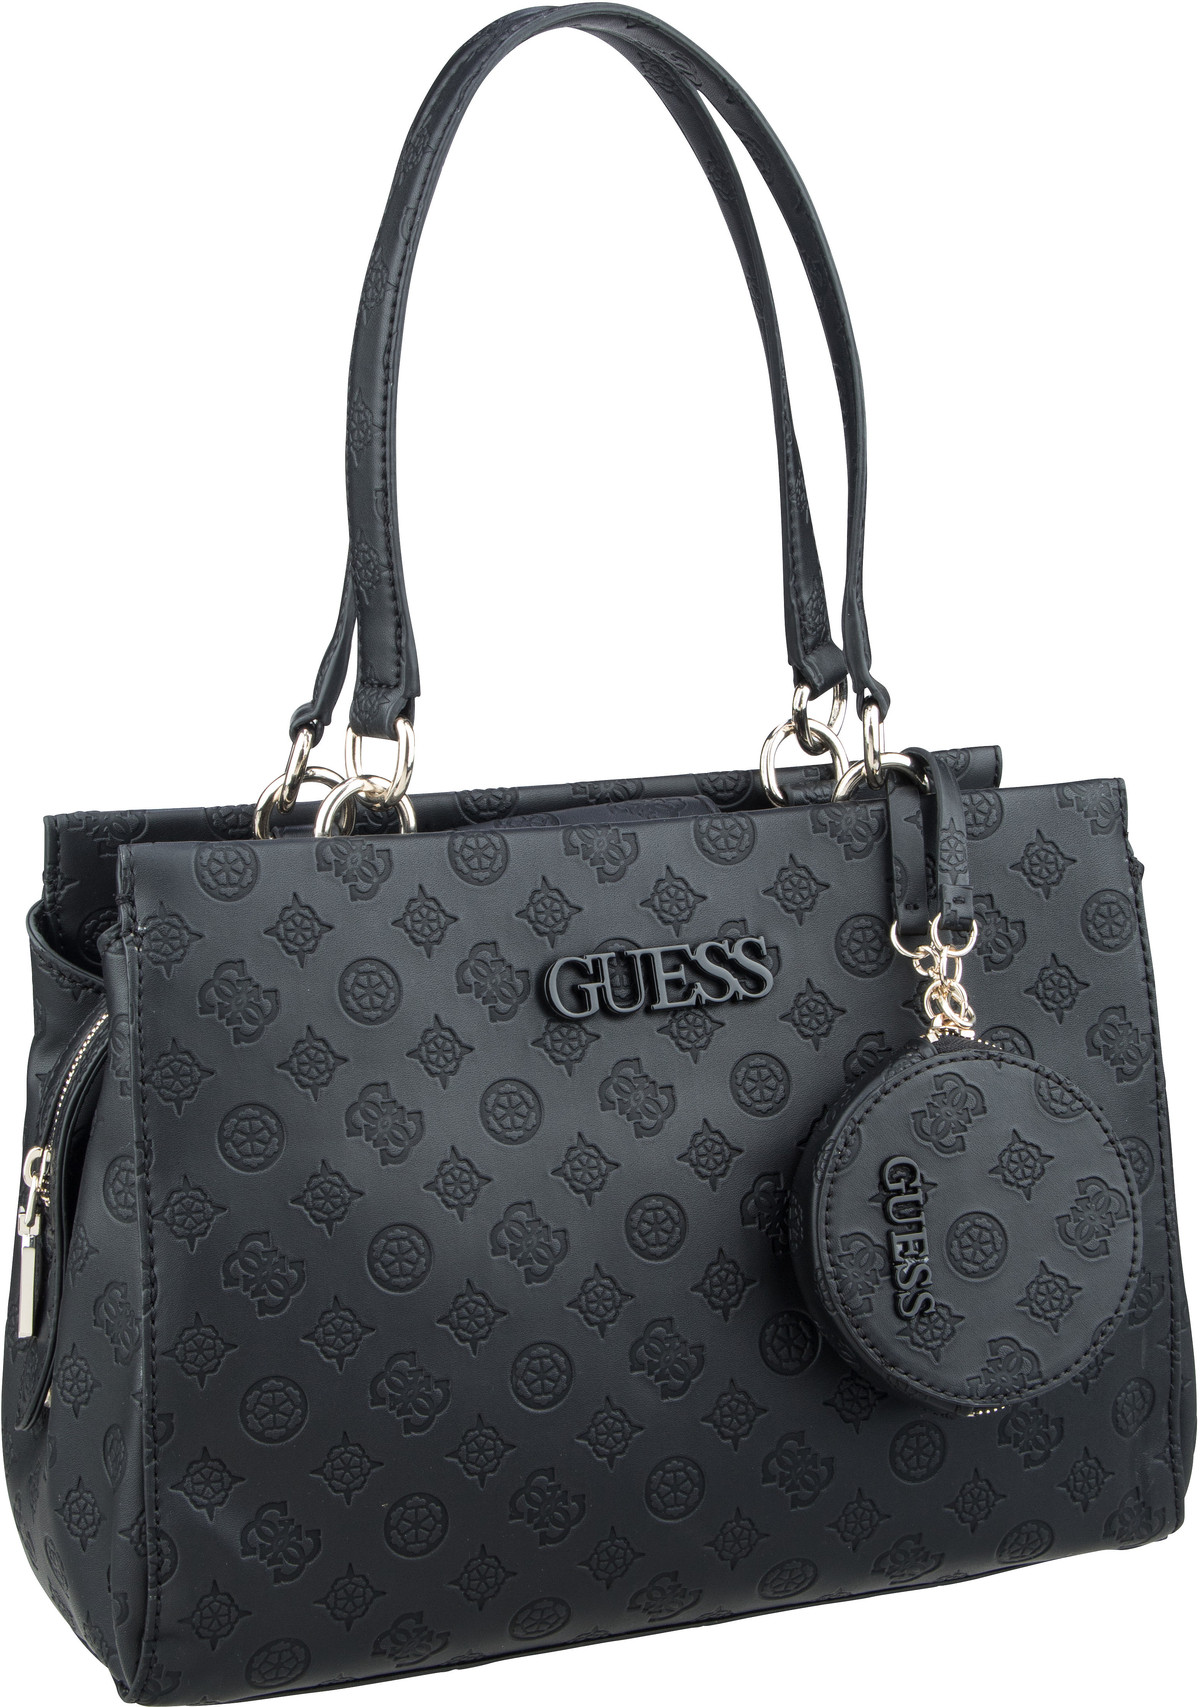 Handtasche Janelle Girlfriend Satchel Black